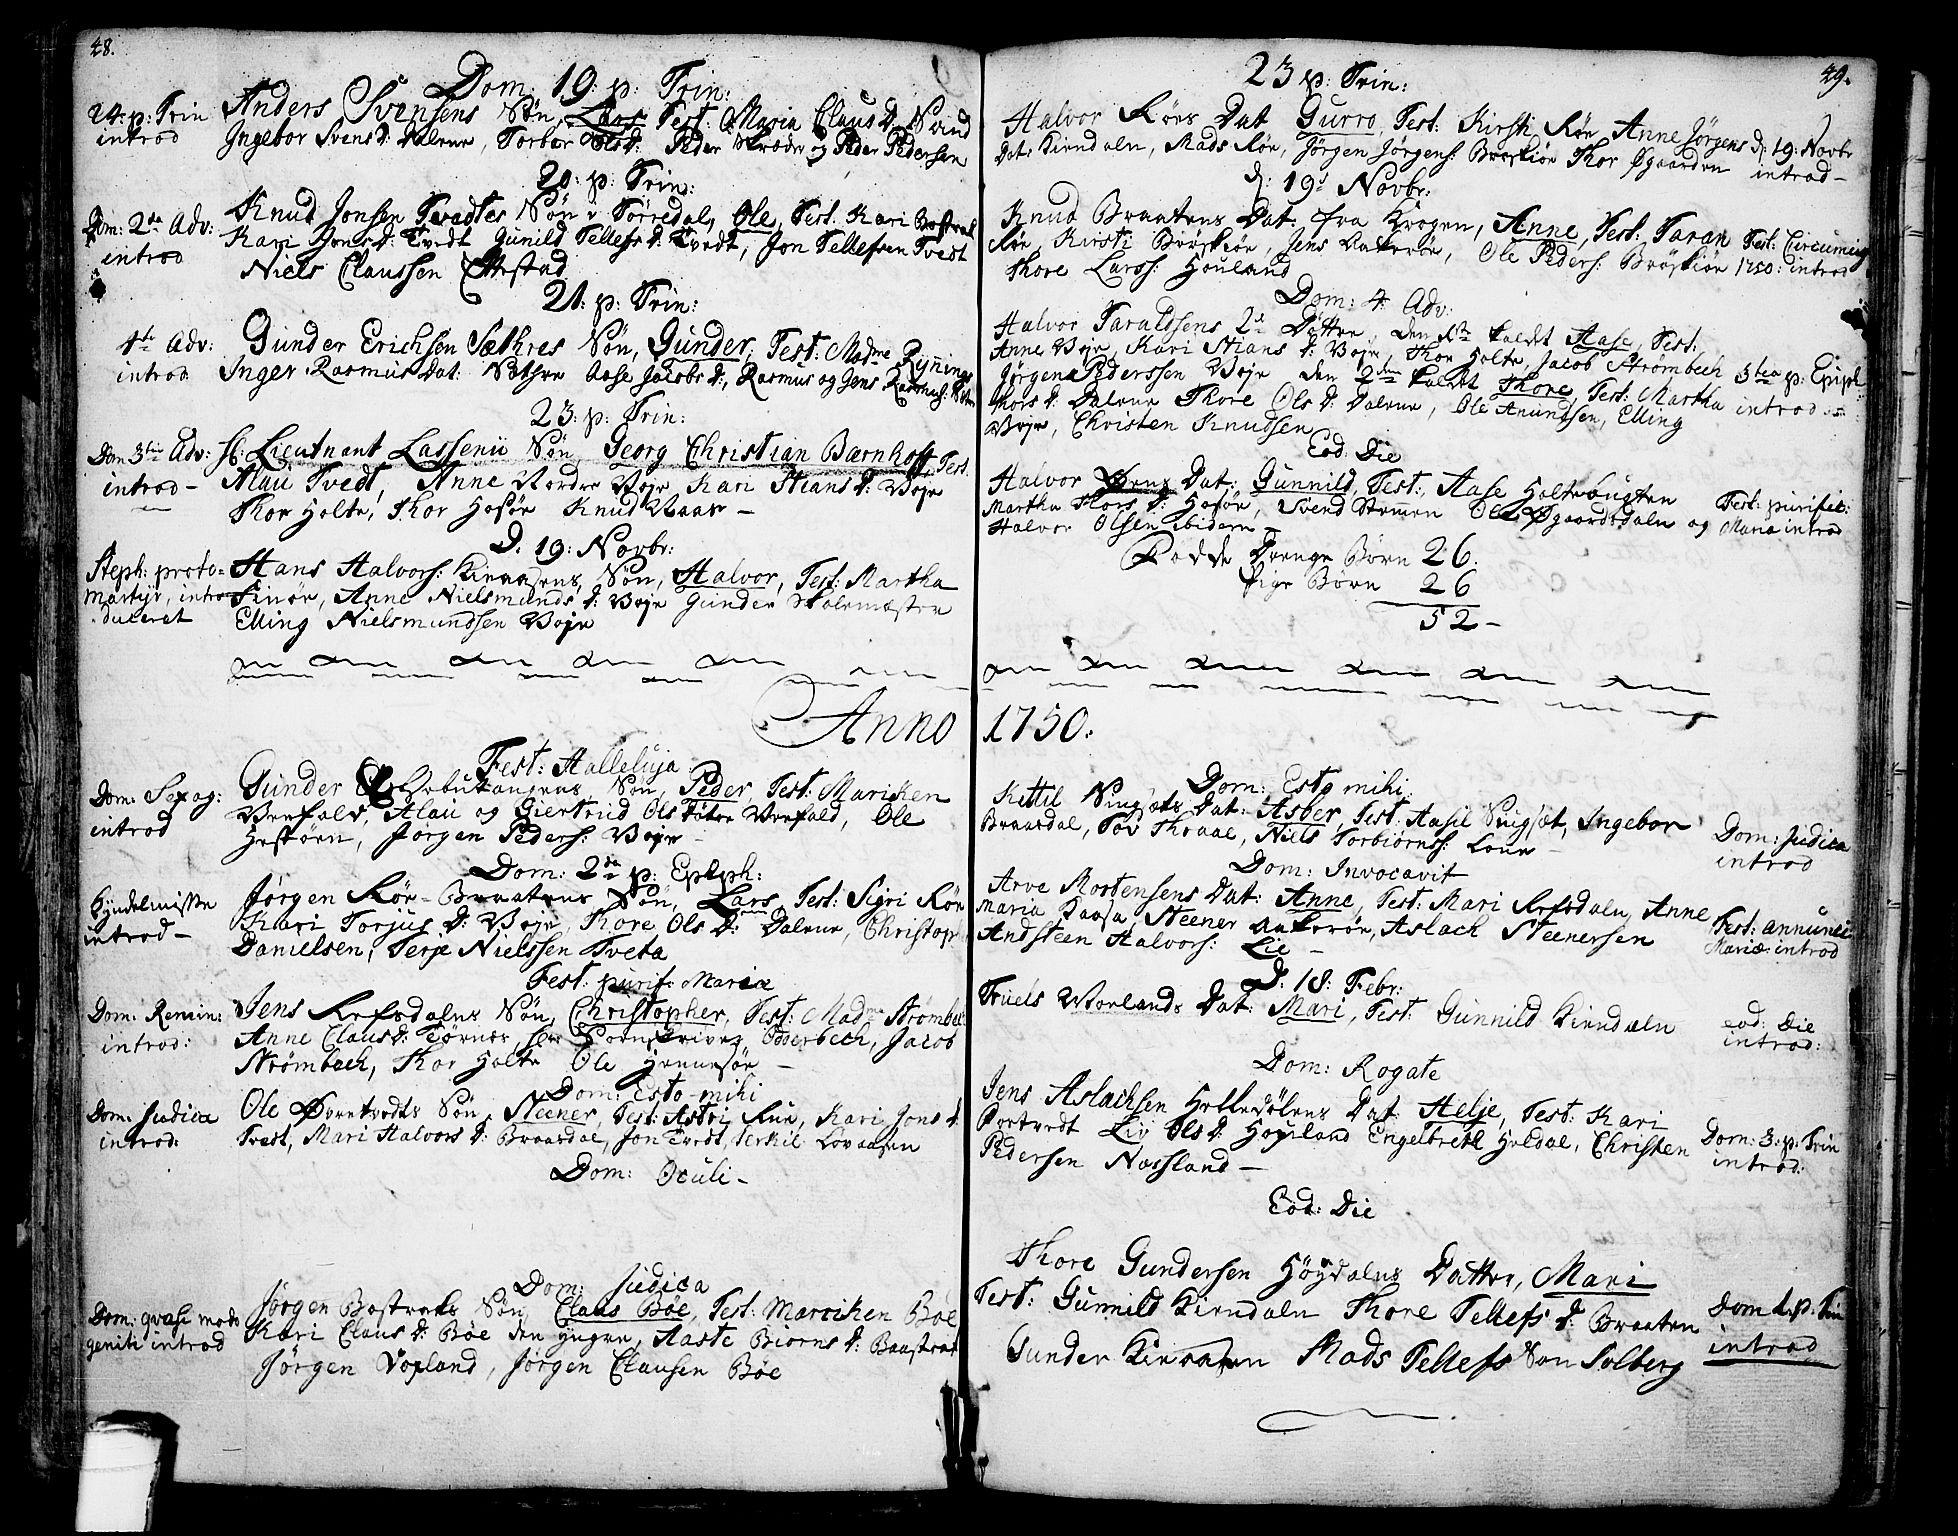 SAKO, Drangedal kirkebøker, F/Fa/L0001: Ministerialbok nr. 1, 1697-1767, s. 48-49